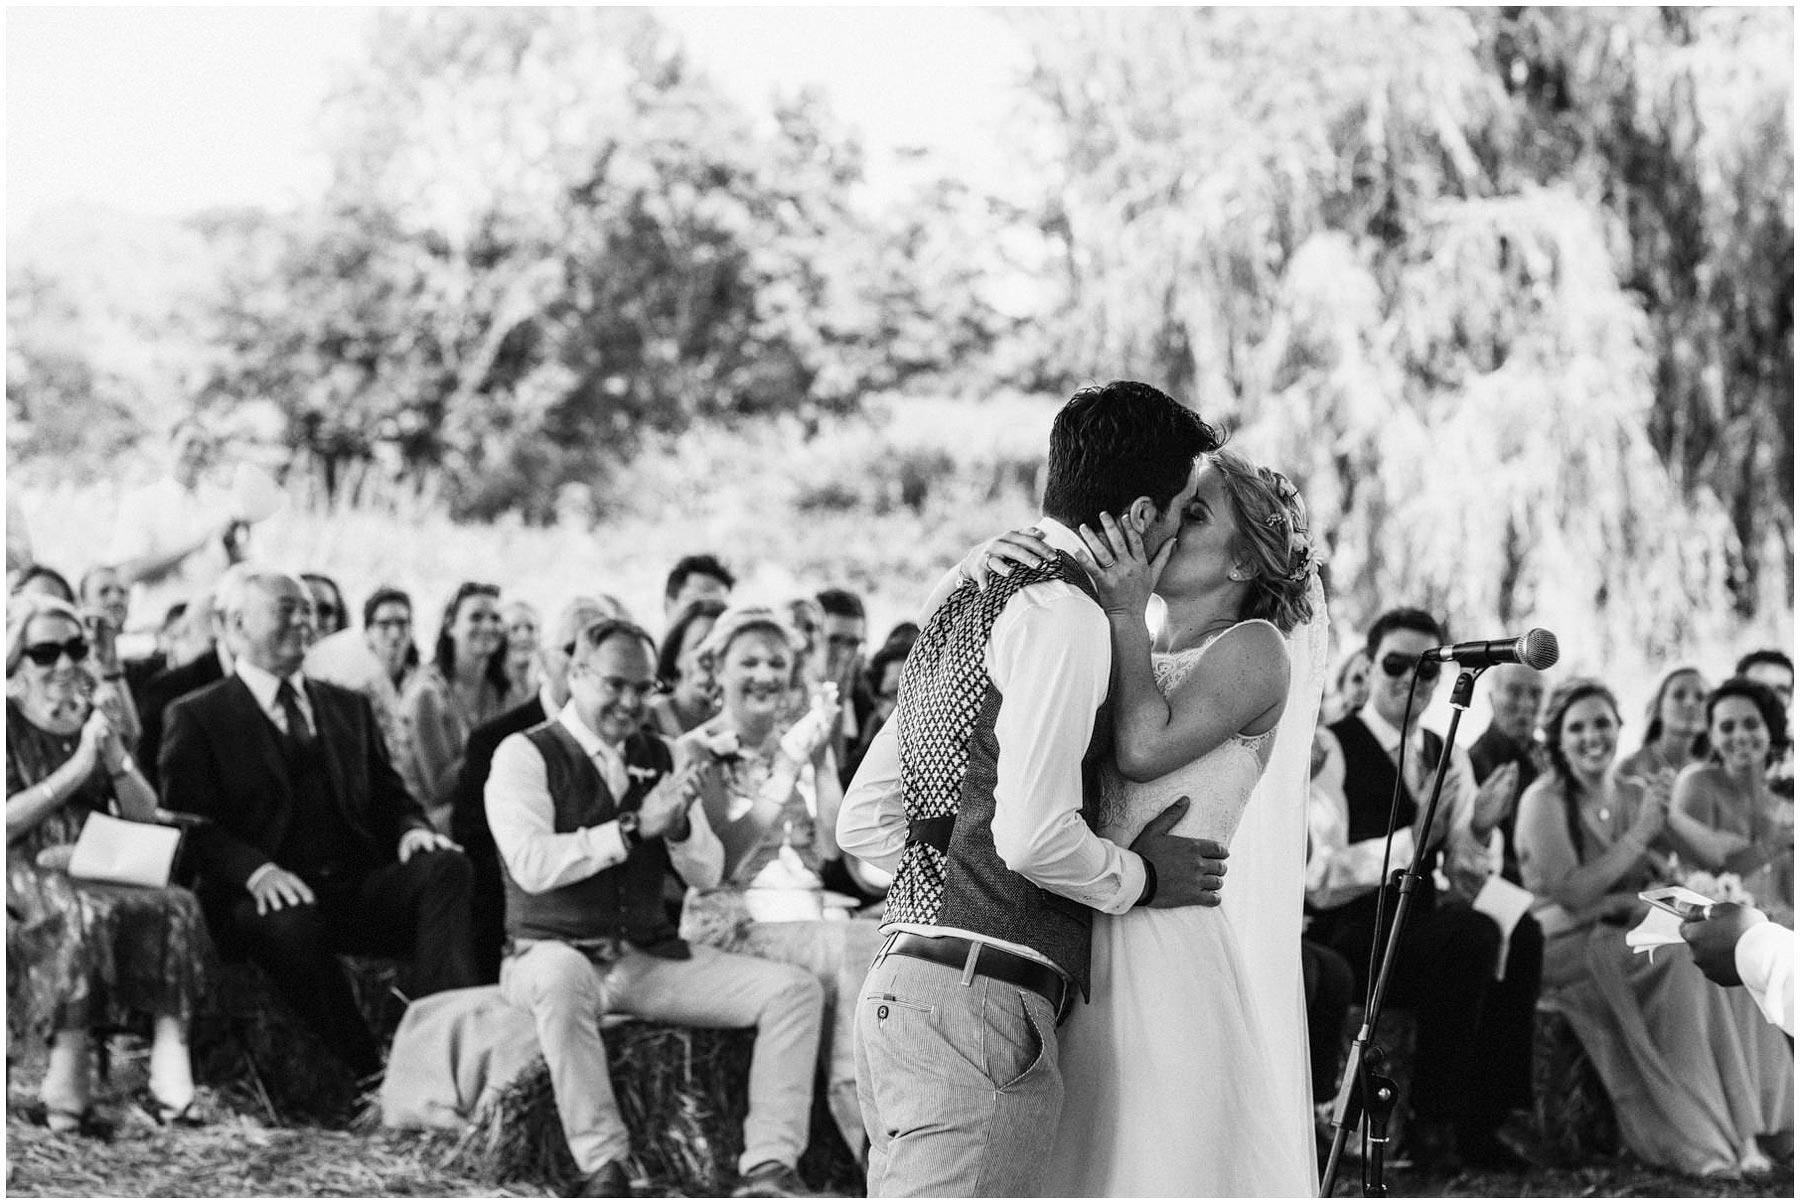 Kent-Festival-Tipi-wedding-photography_0075